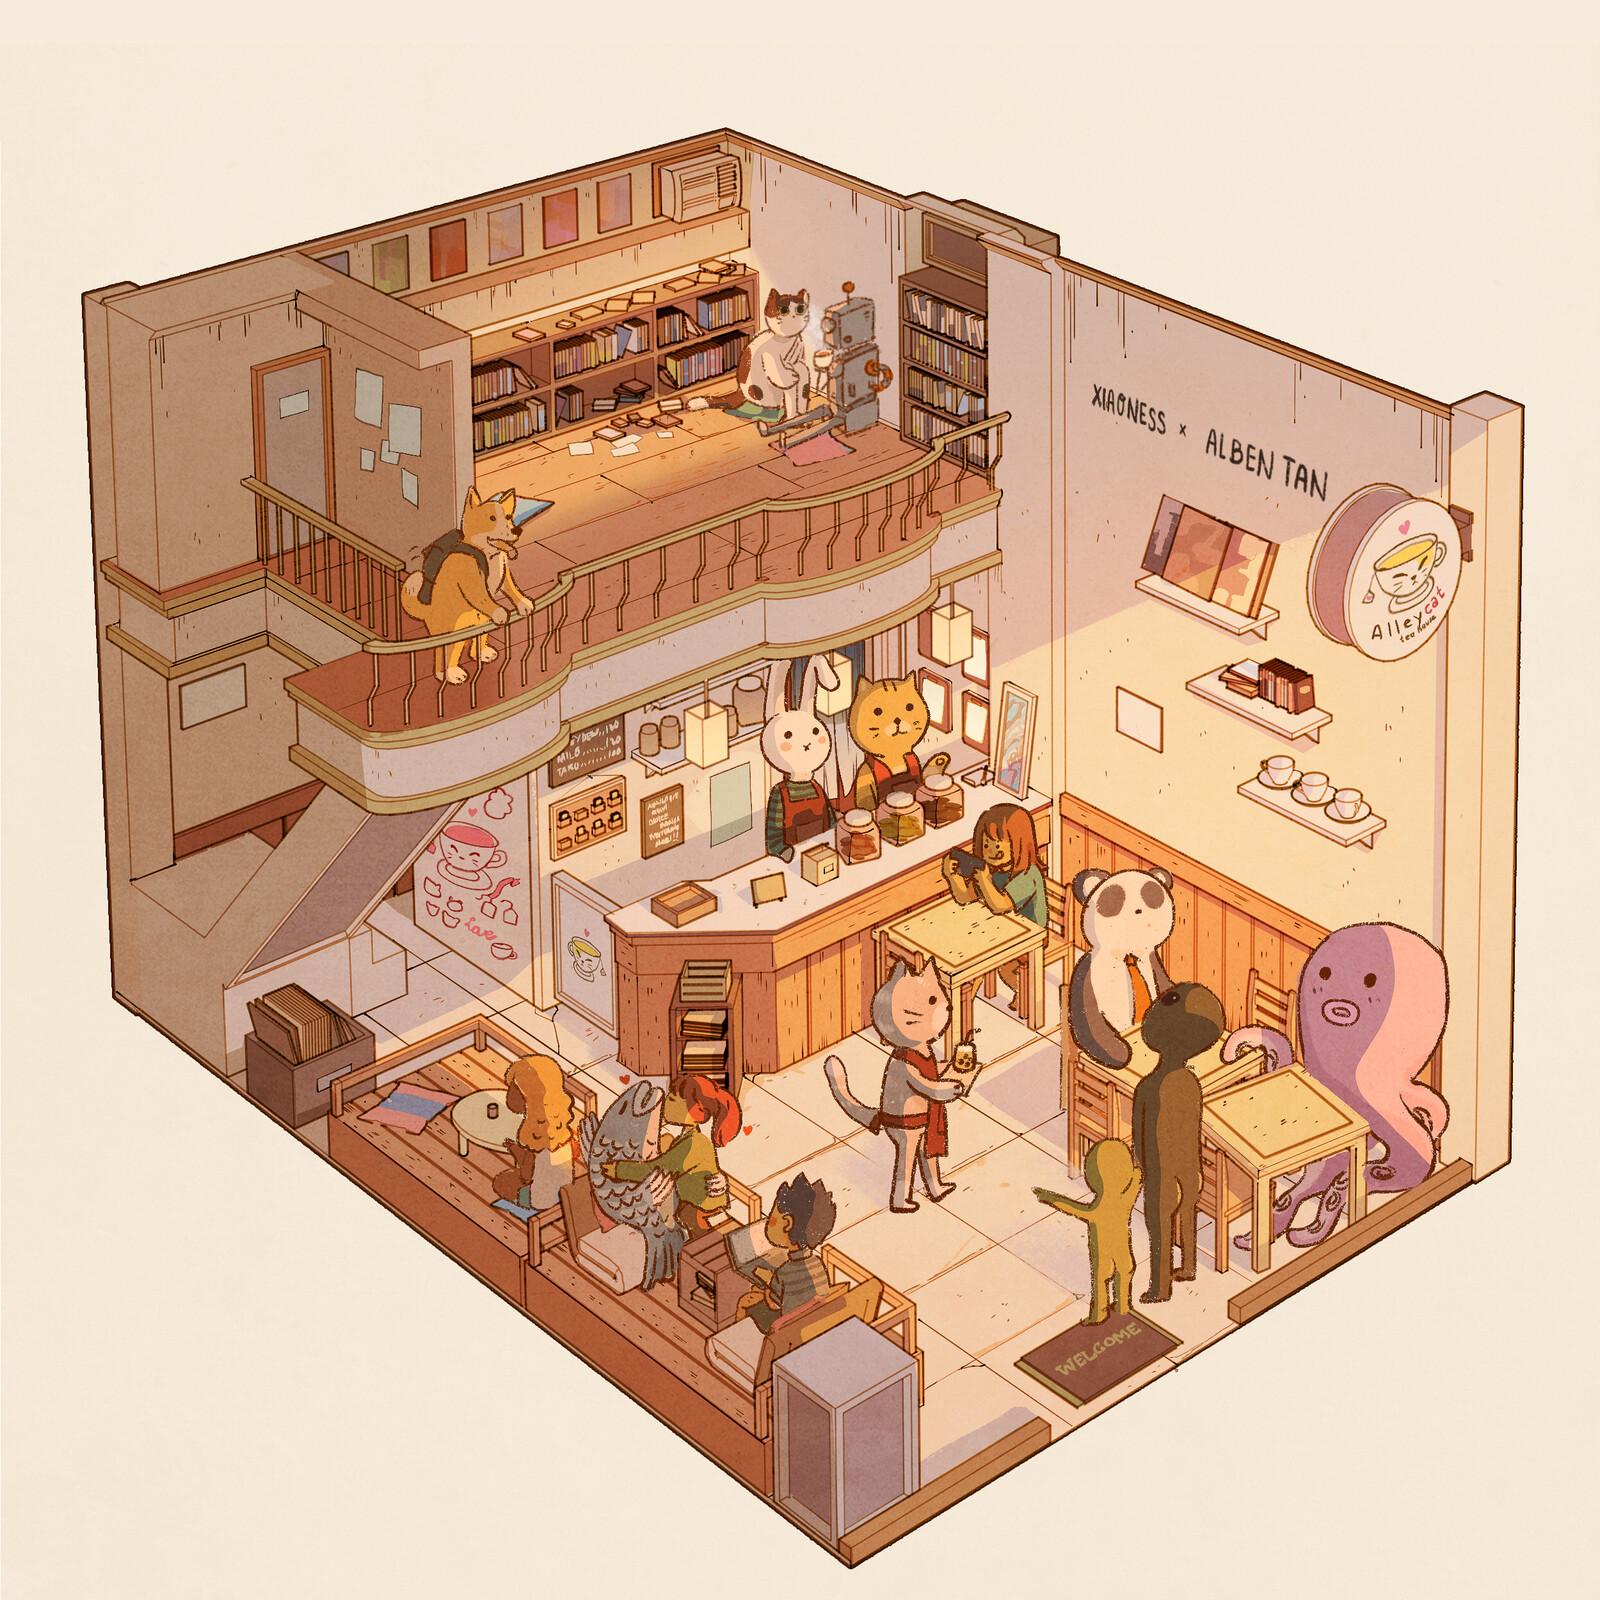 Alleycat Tea House